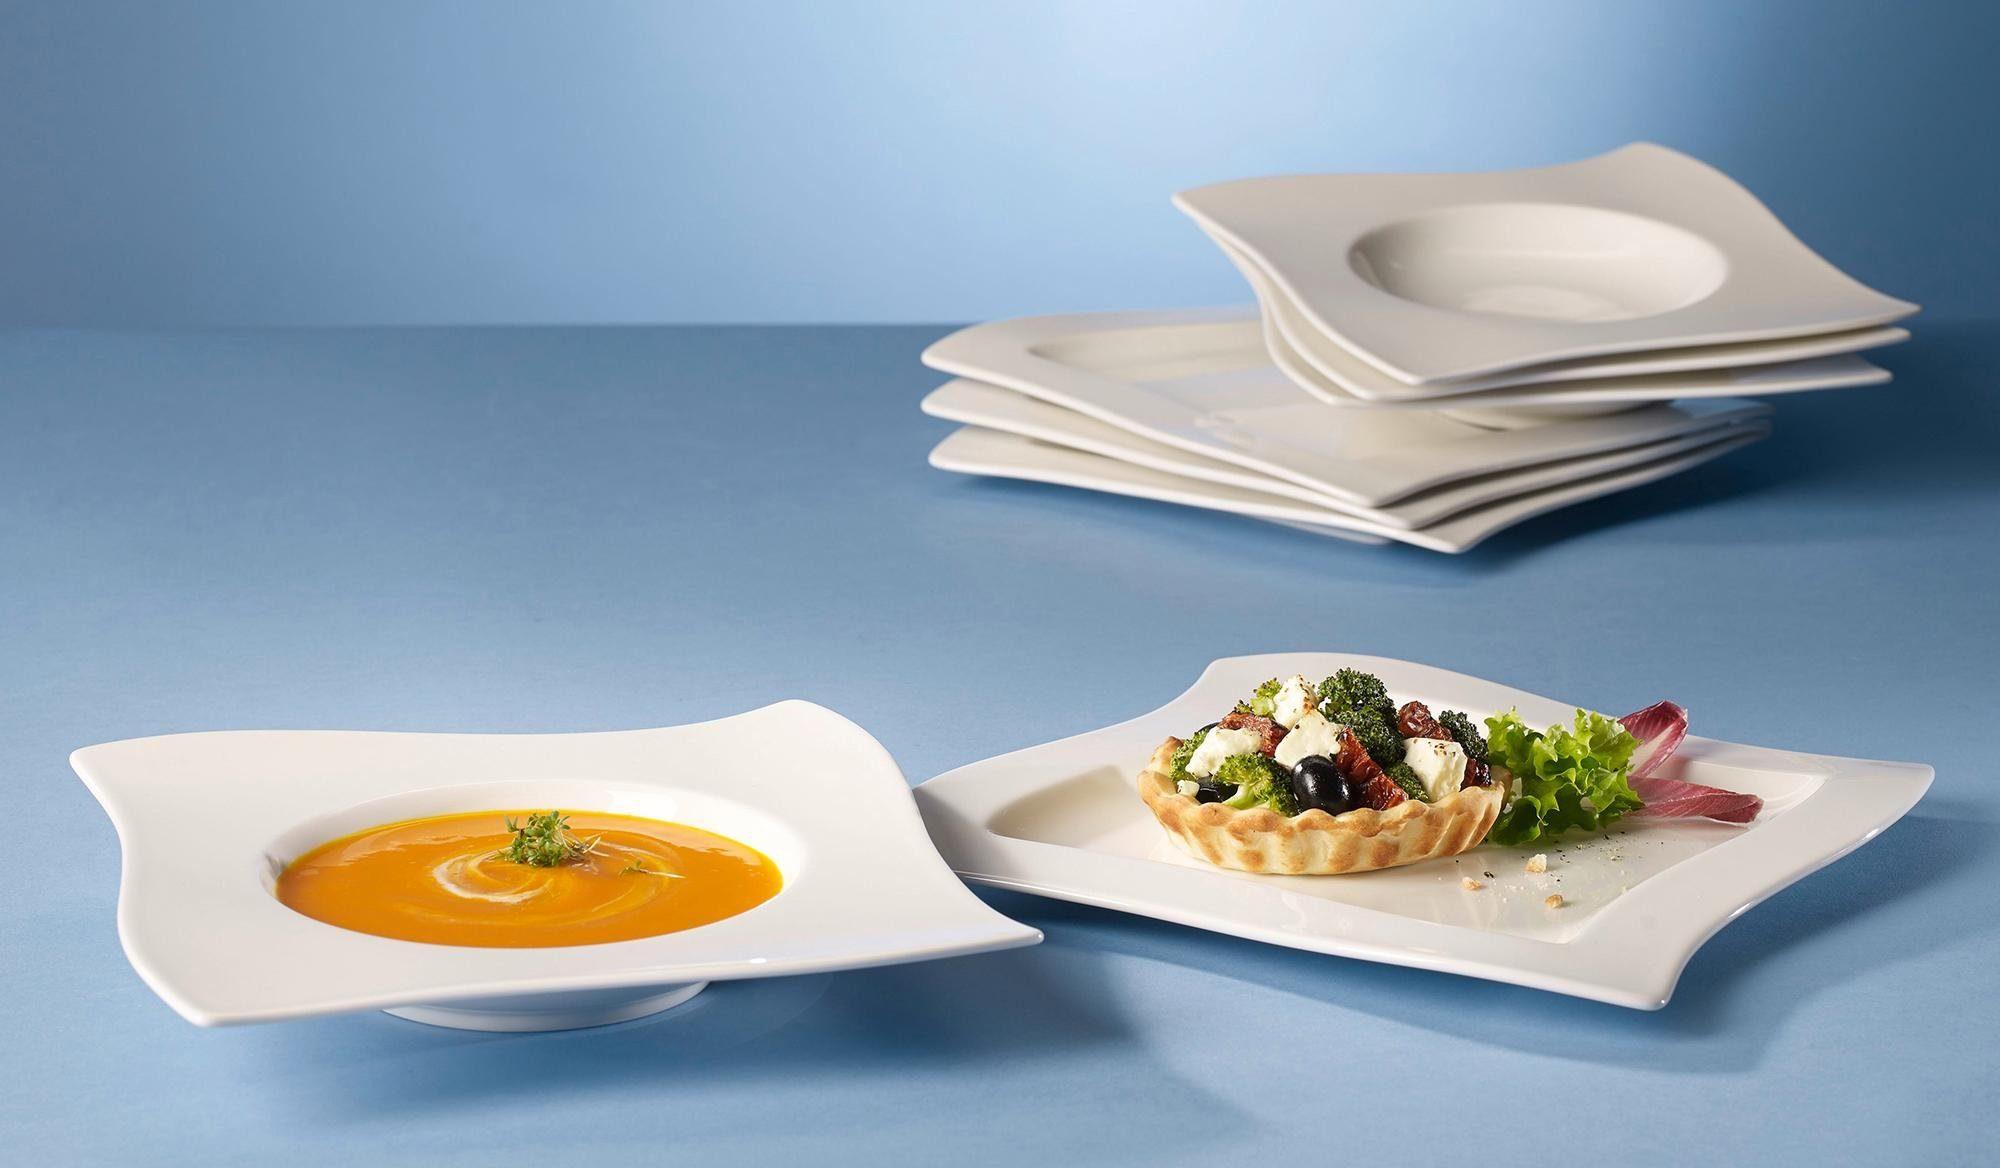 Villeroy & Boch Dinner-Set, Porzellan, 8 Teile, »NewWave«